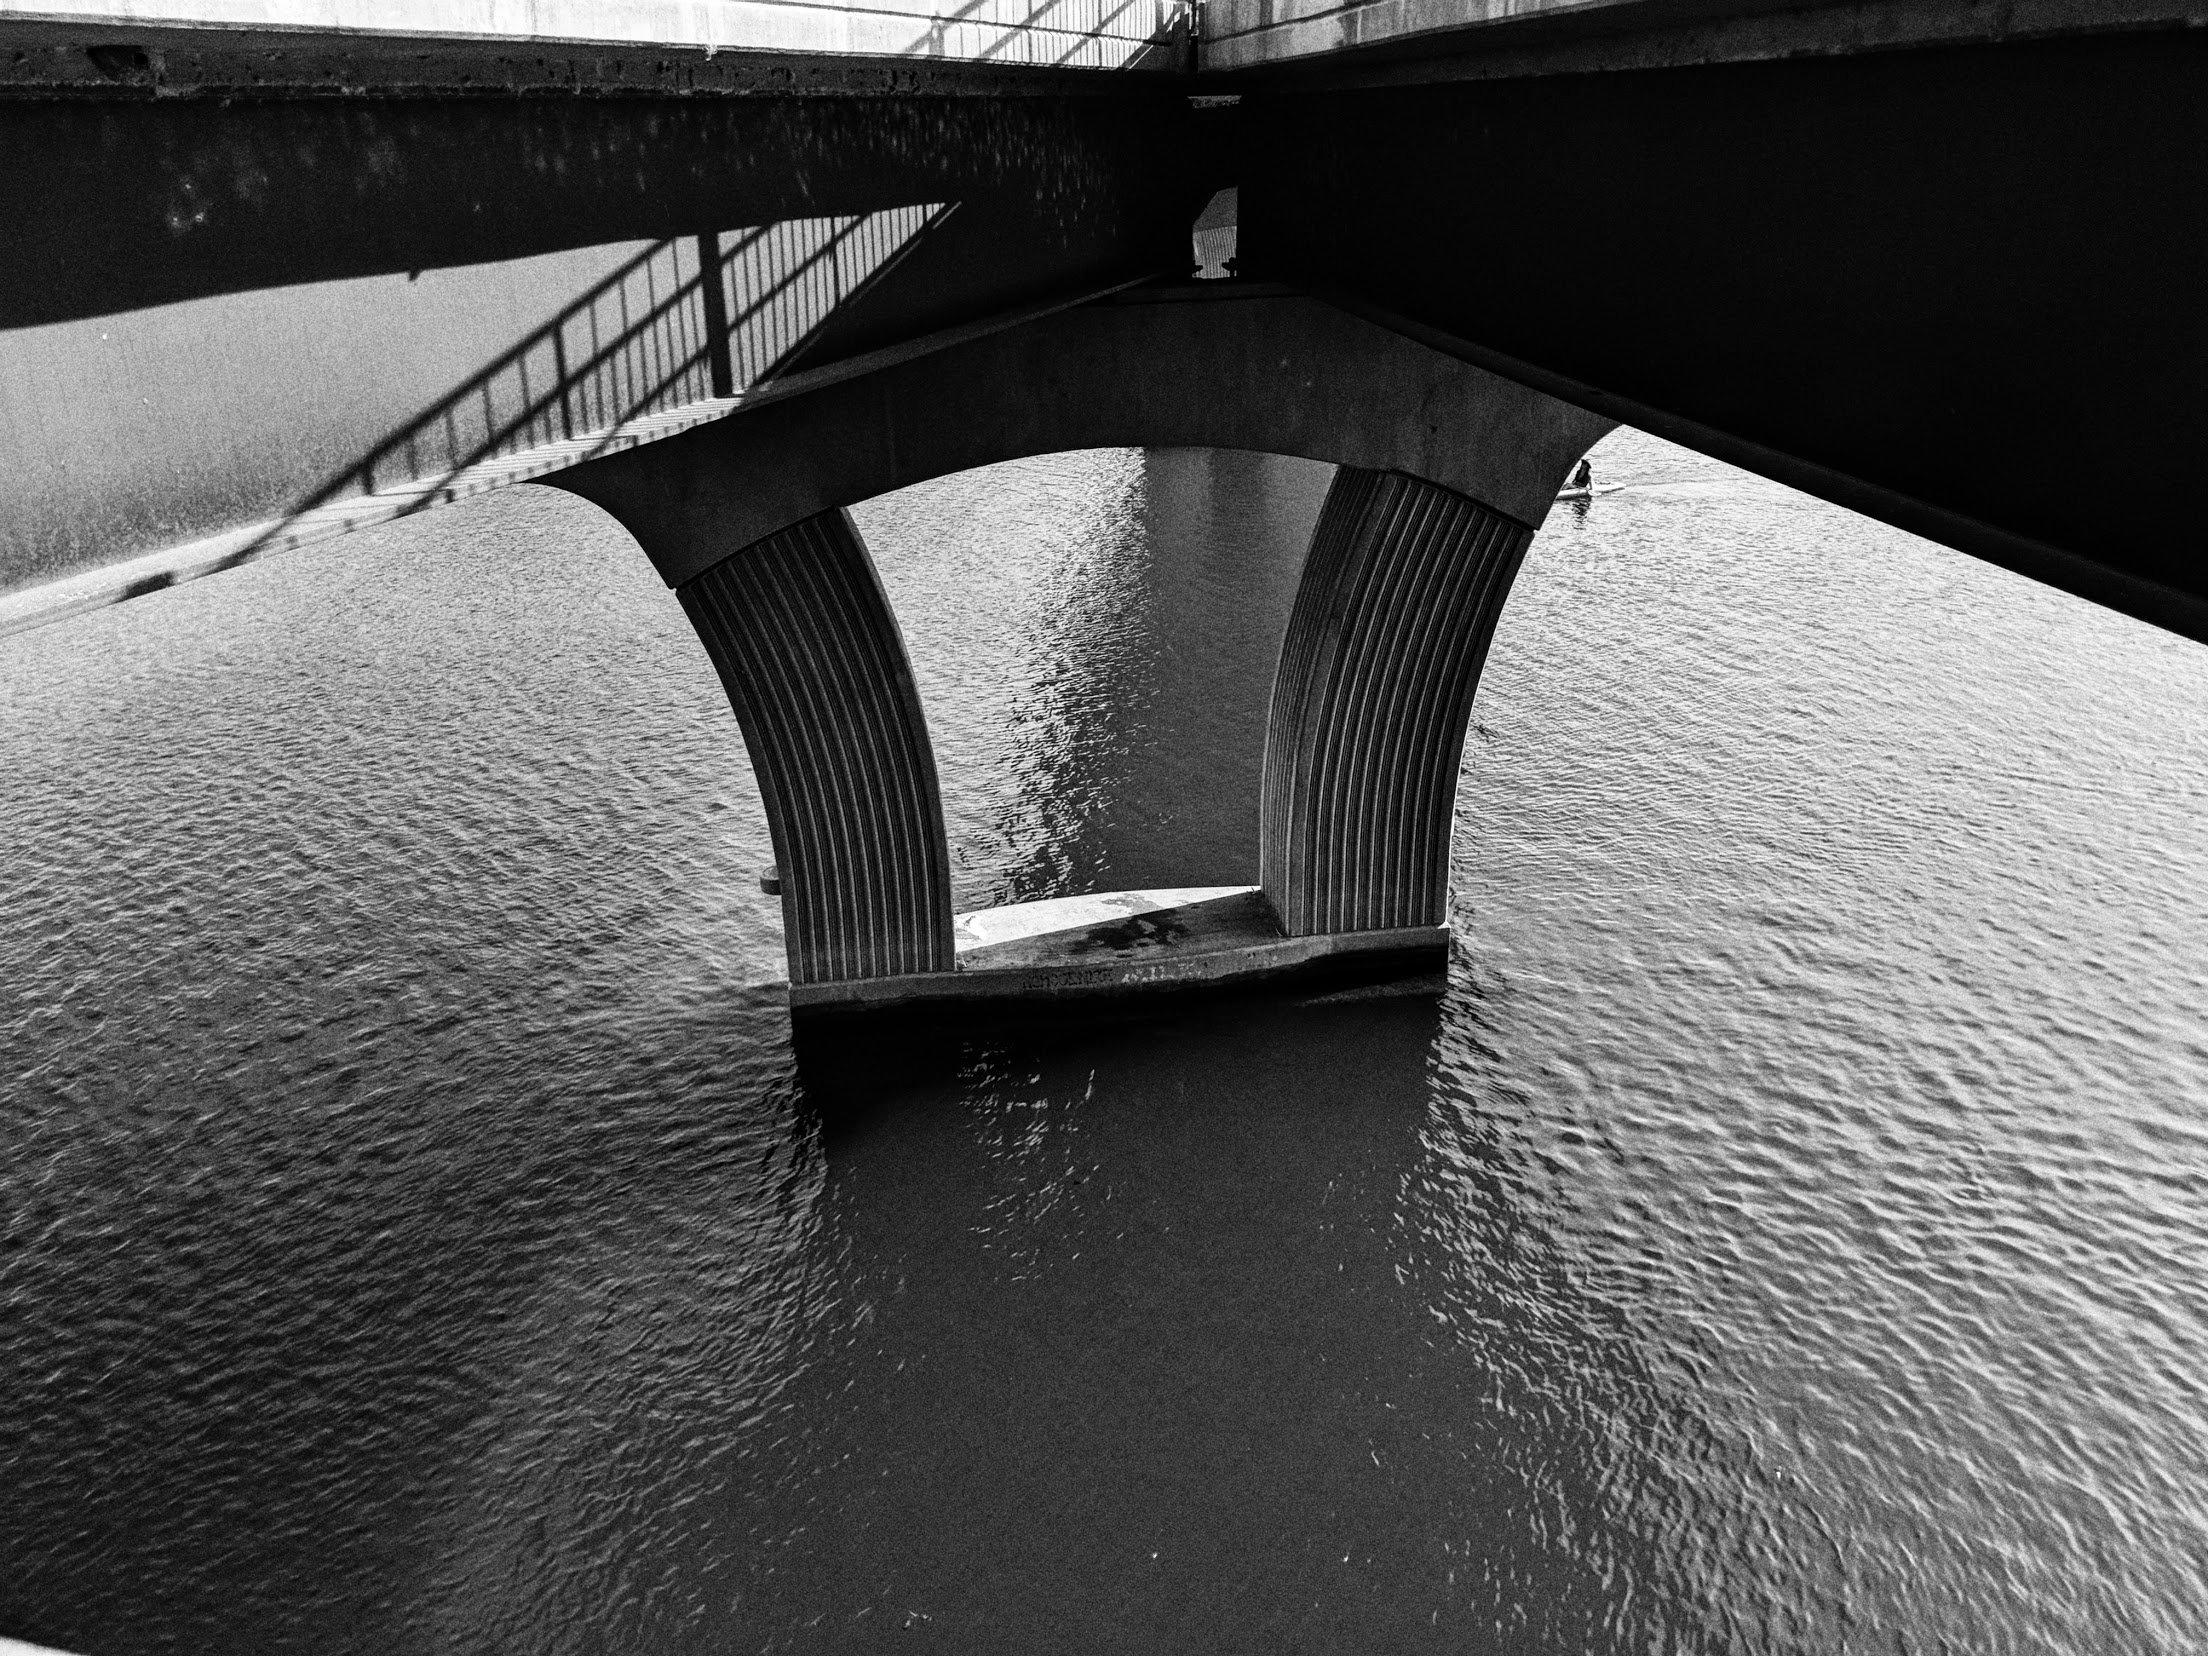 Stephen Briseño - Photography